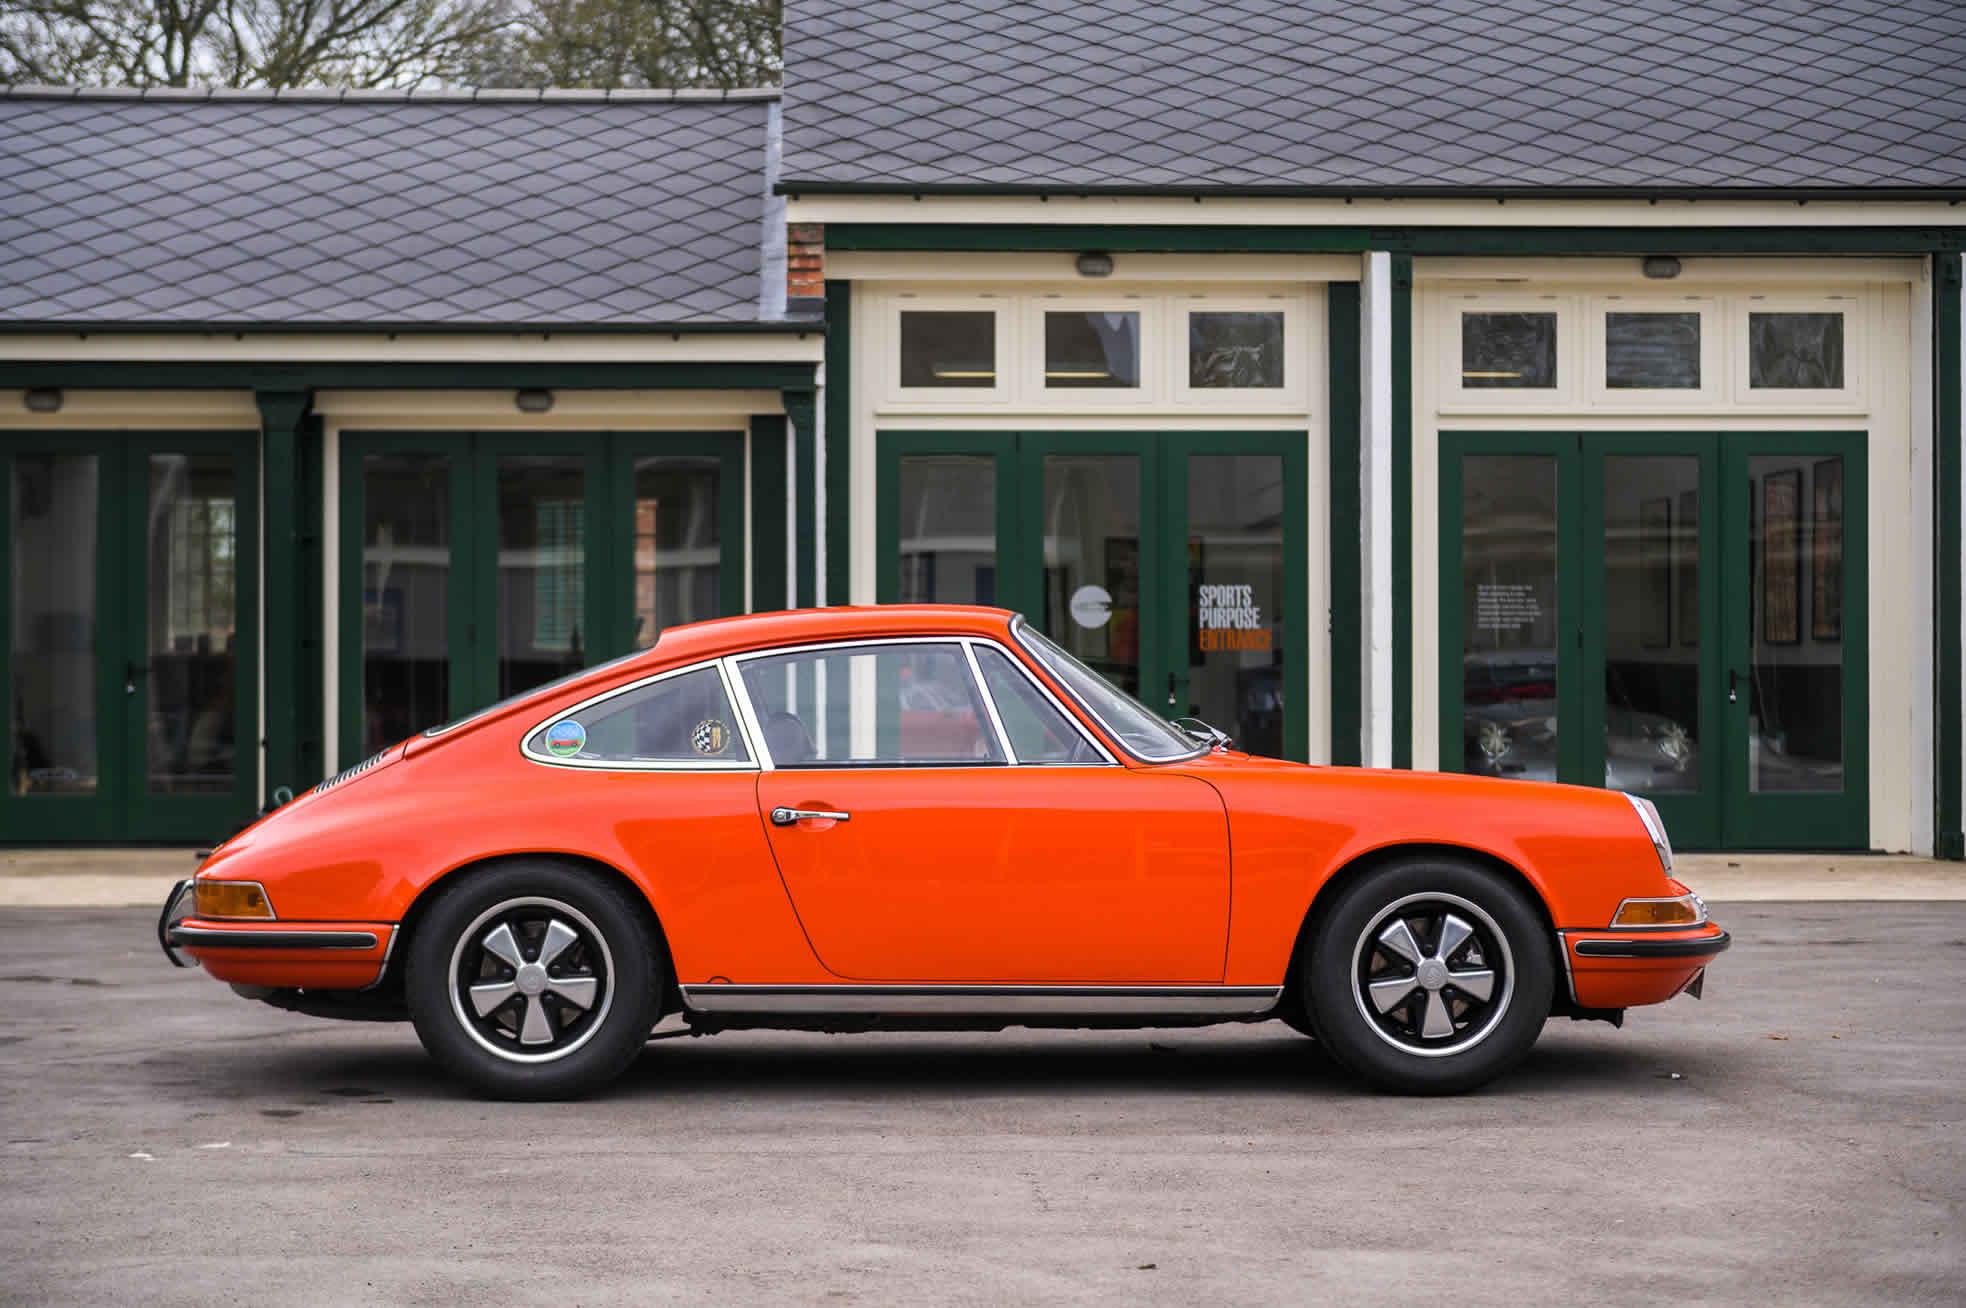 For Sale 1970 Porsche 911S 2.2, Sports Purpose, Bicester Heritage,